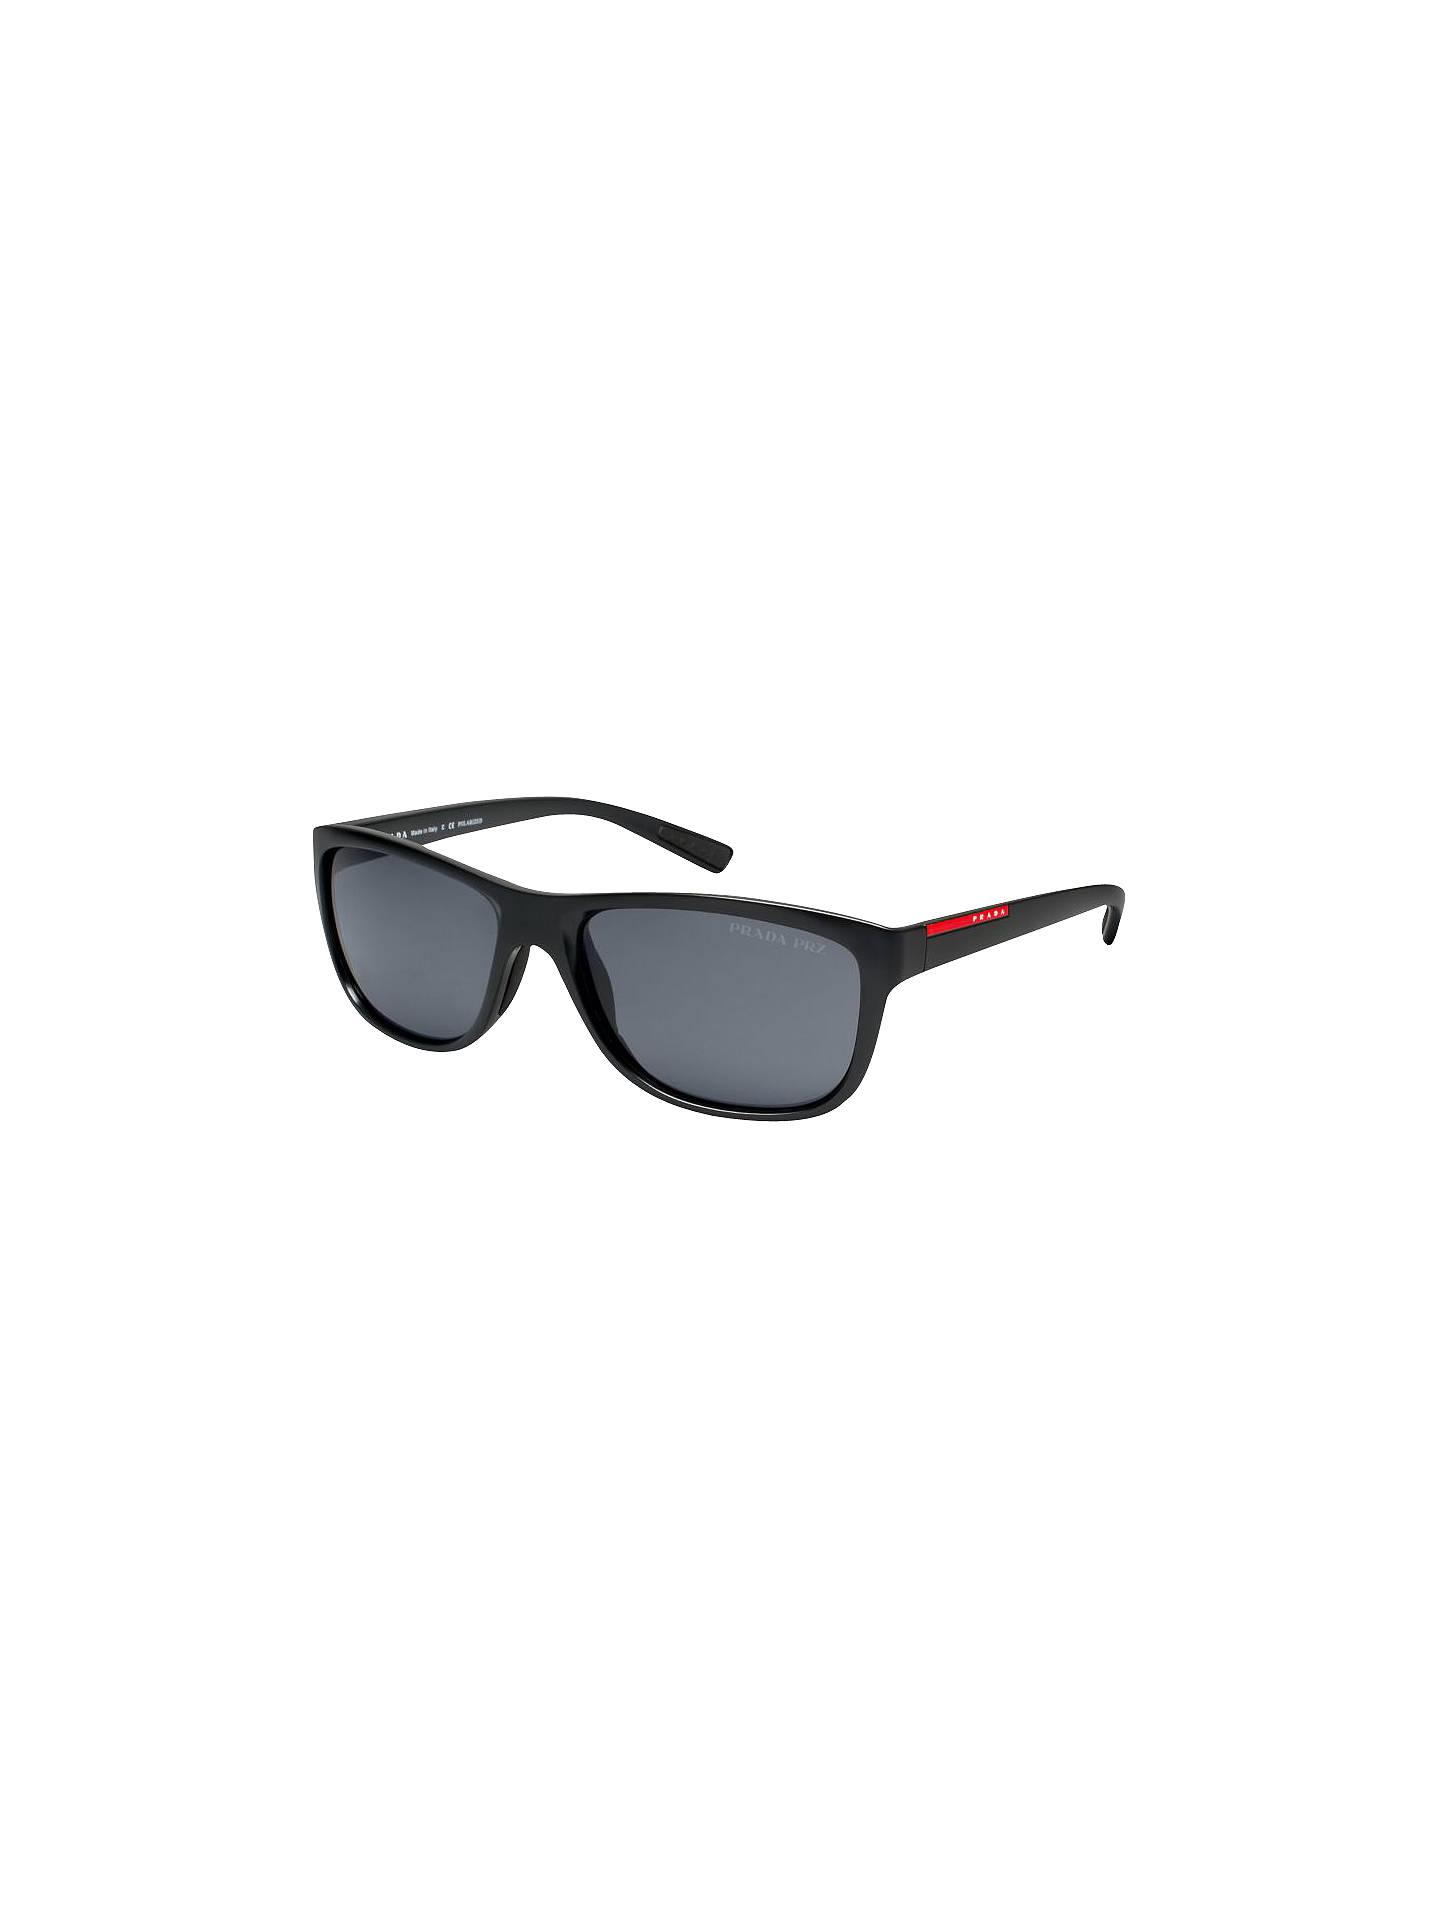 655535f202 BuyPrada Linea Rossa PS 05PS Pillow Frame Polarised Sunglasses